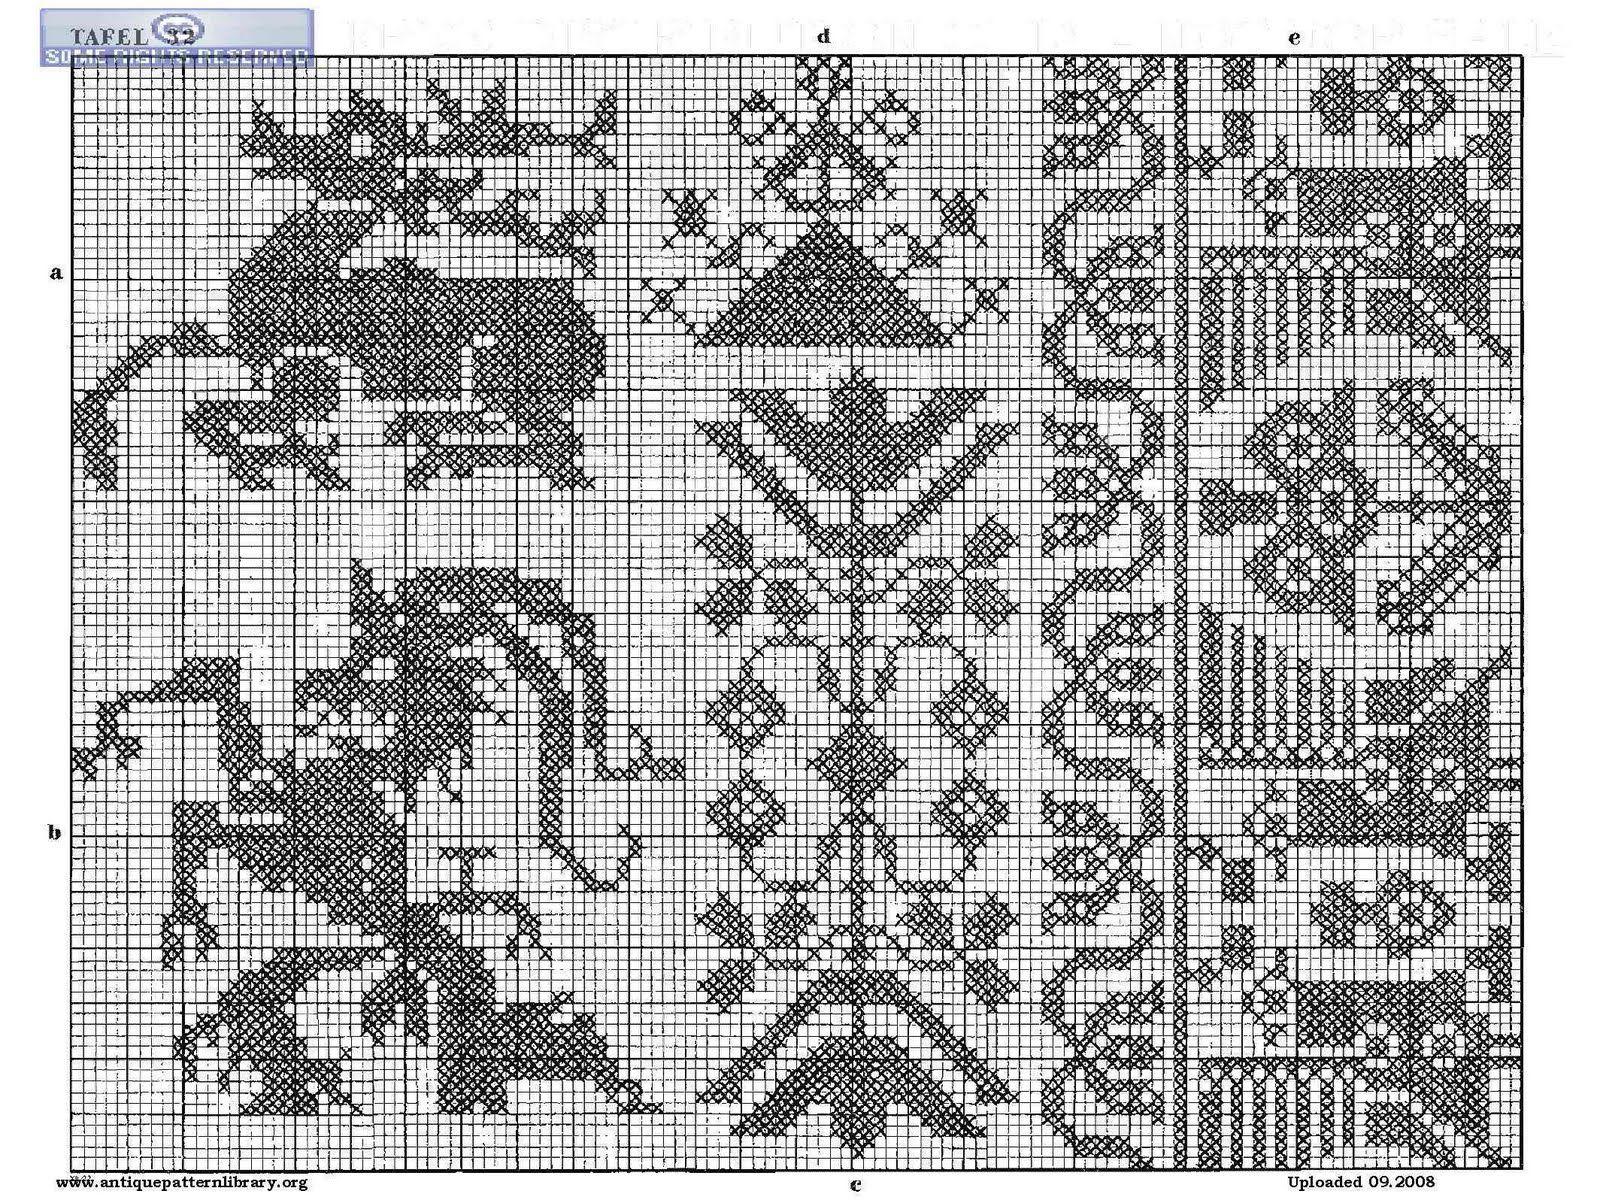 Pin by zehra kolba on hesapisi 2 pinterest crochet easy cross cross patterns crochet tablecloth pattern books doilies charts cross stitch bankloansurffo Gallery